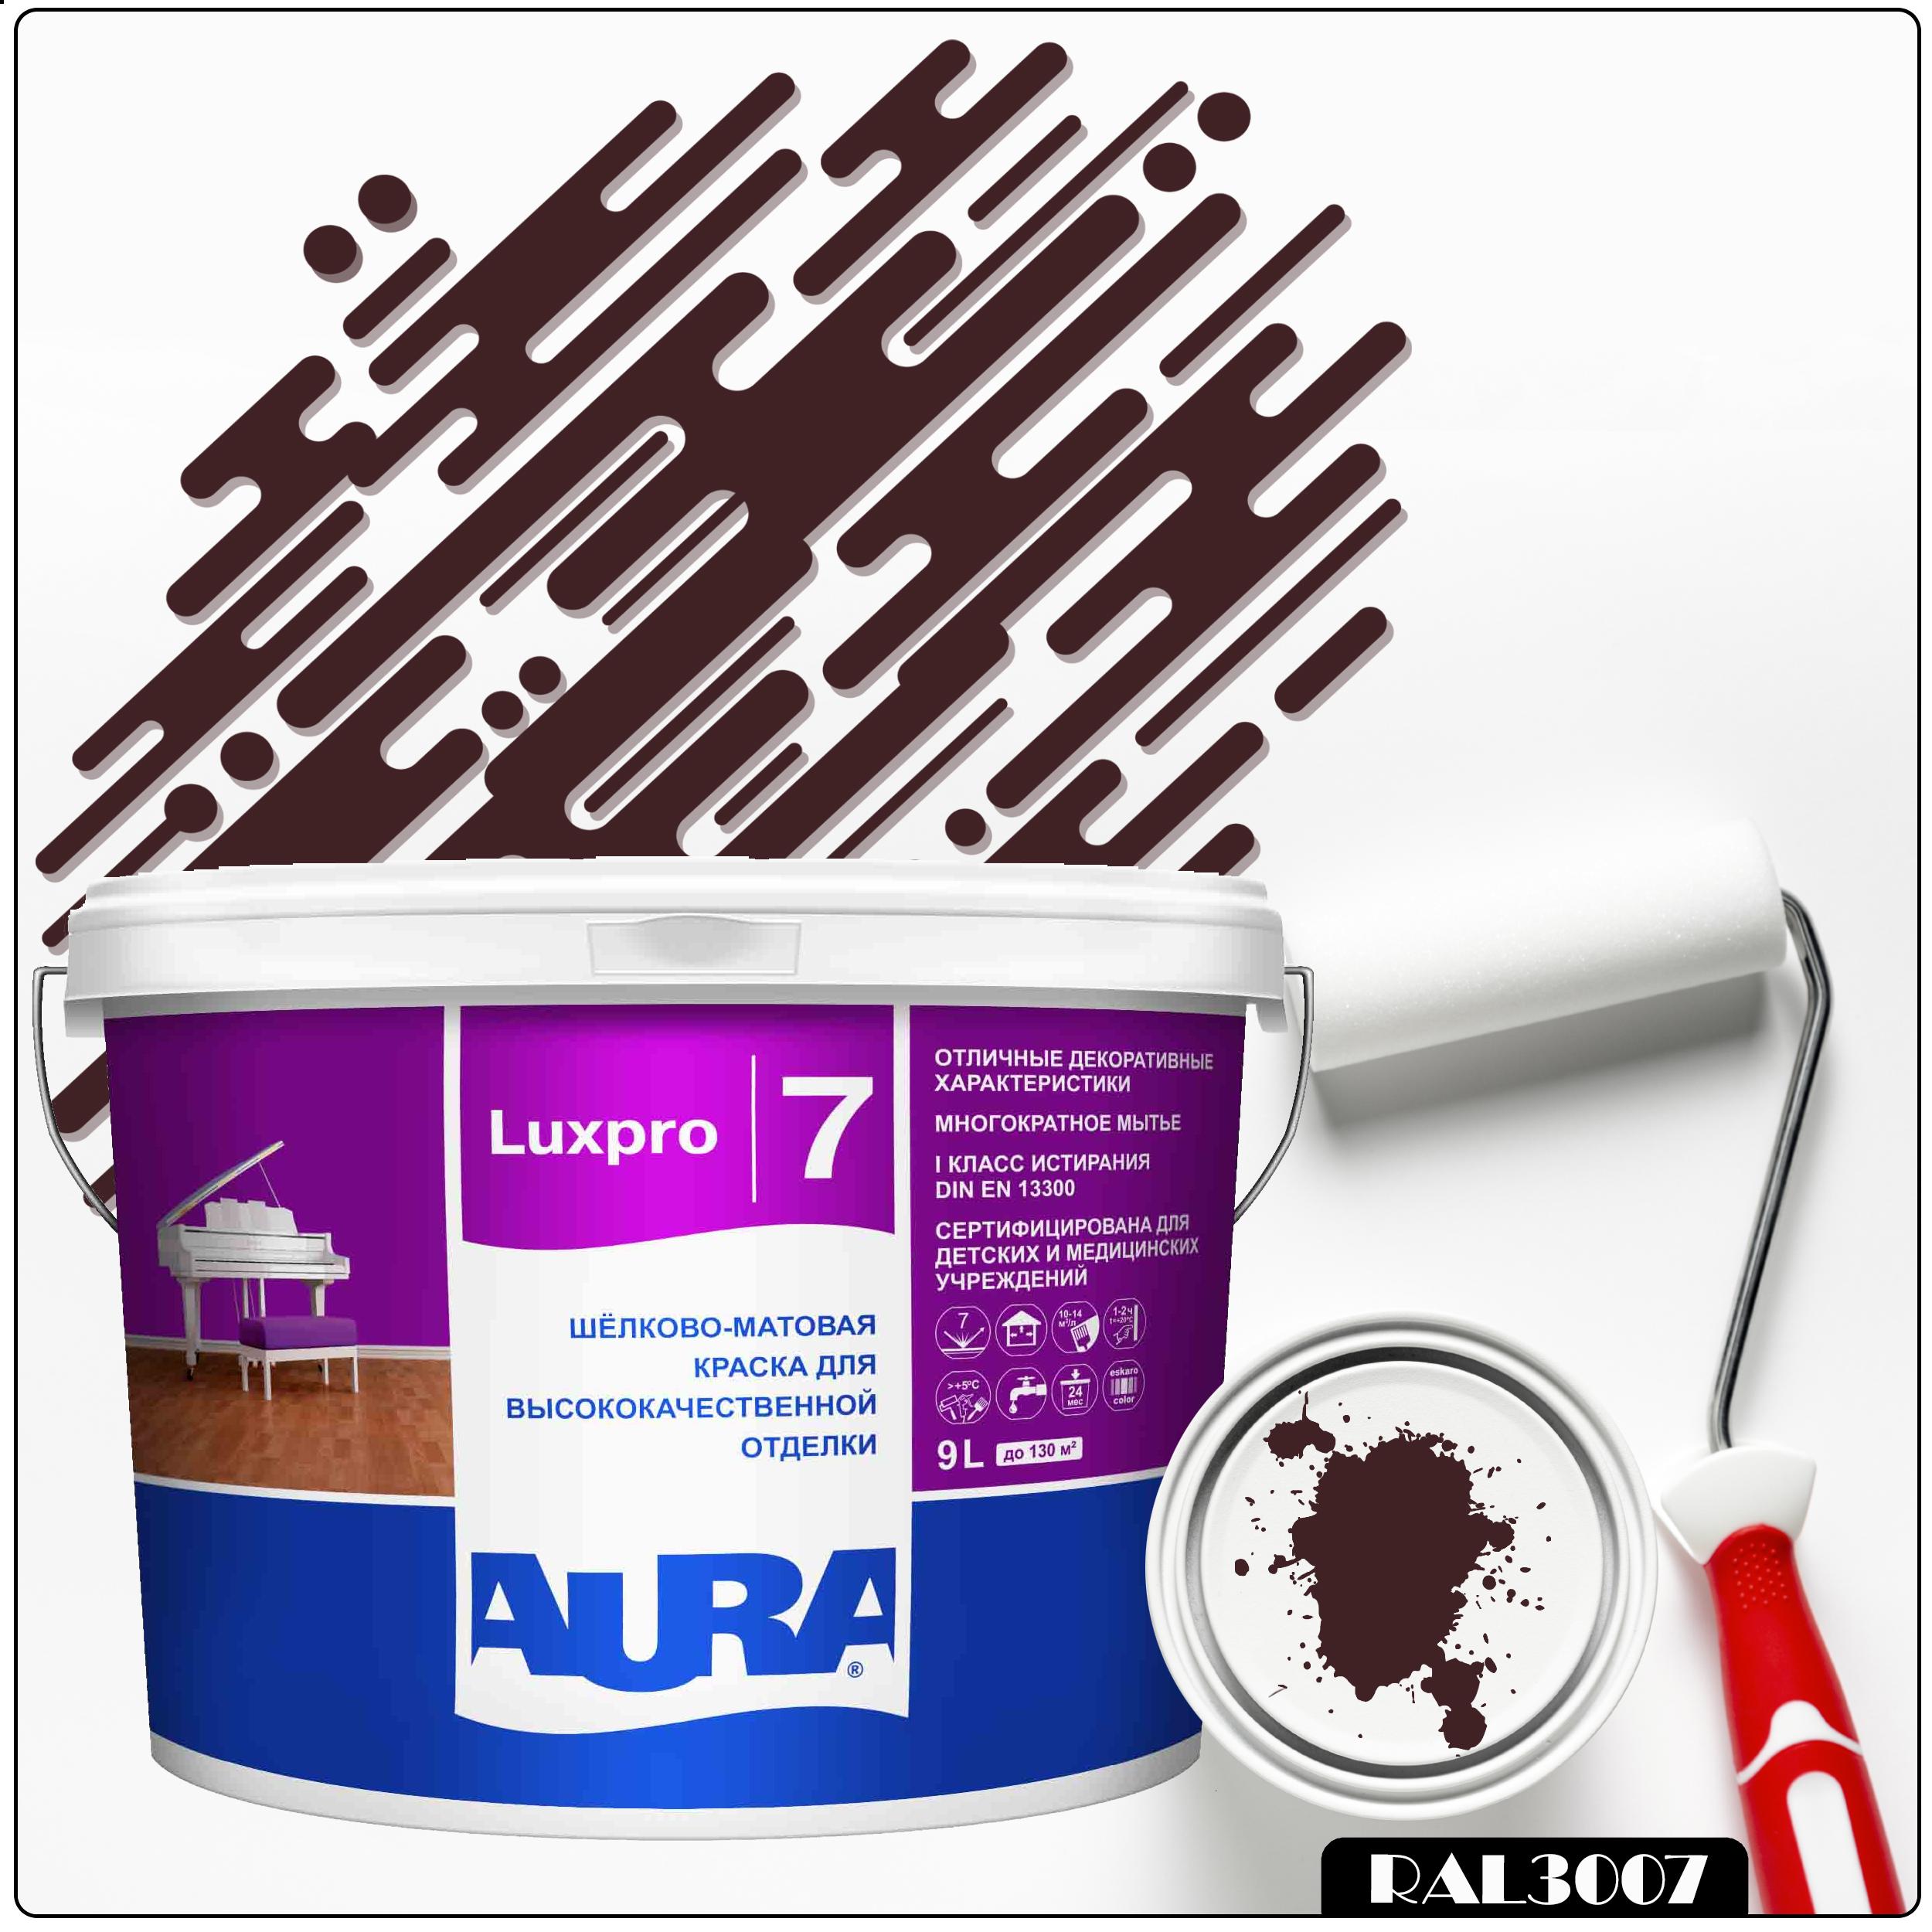 Фото 7 - Краска Aura LuxPRO 7, RAL 3007 Чёрно-красный, латексная, шелково-матовая, интерьерная, 9л, Аура.